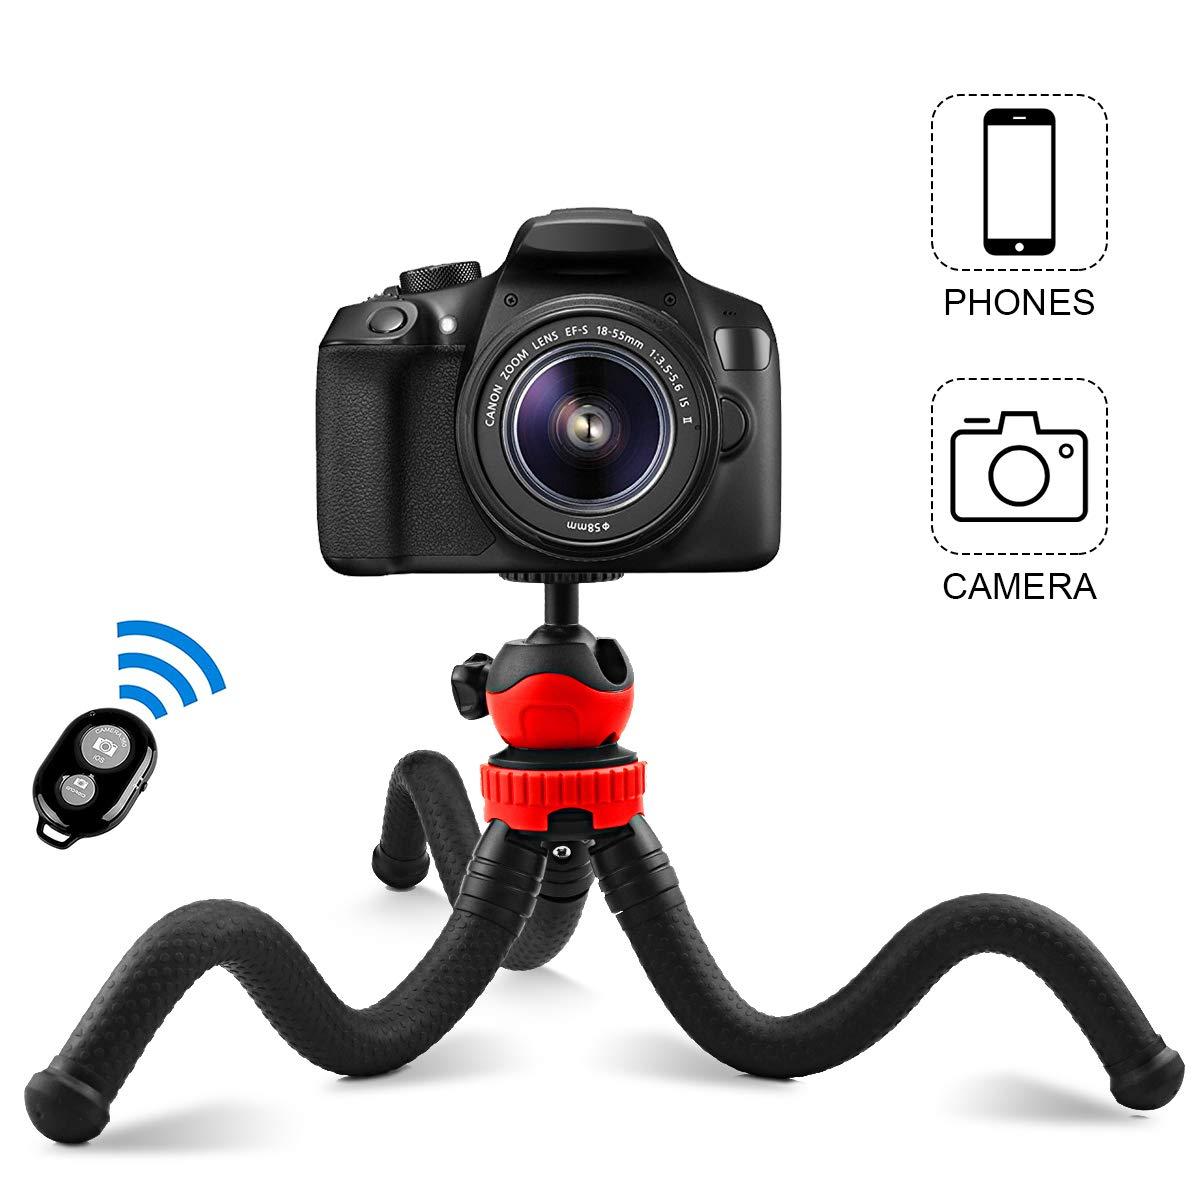 8 S8 Samsung S9 Huawei P20 y Otros Android e iOS Abafia Palo Selfie Tr/ípode 4.5-6.5 3 en 1 Selfie Stick Bluetooth Extensible Rotaci/ón de 360 /° con Control Remoto para iPhone XS//X